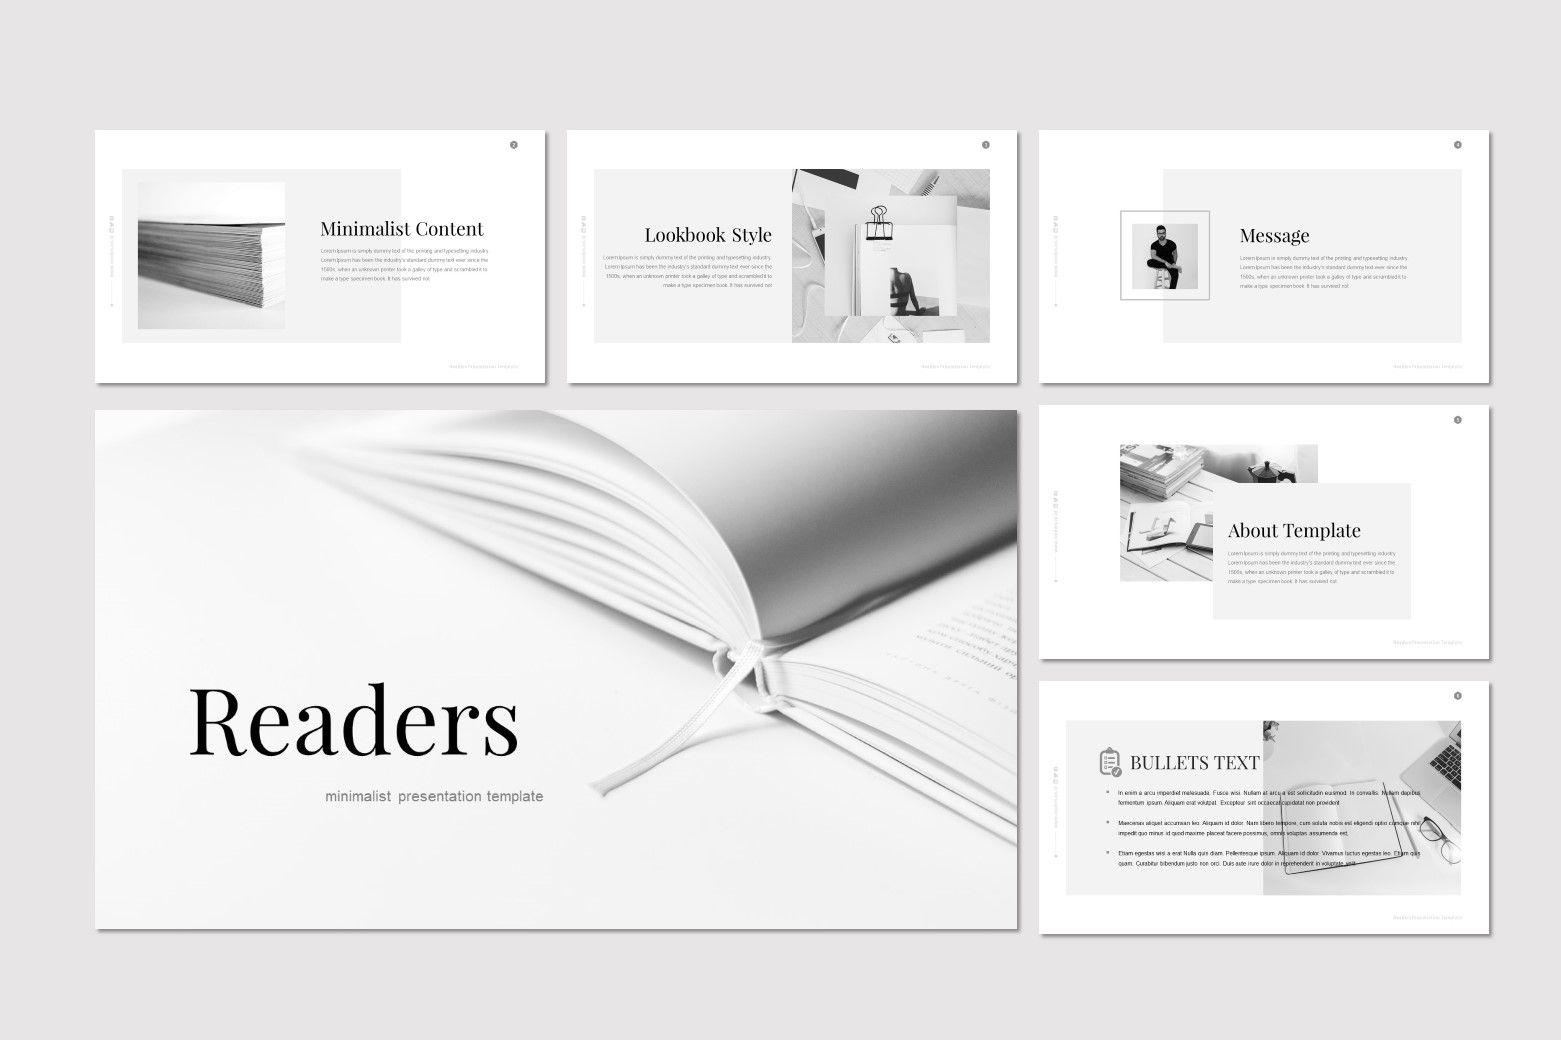 Readers - Google Slides Template, Slide 2, 07164, Presentation Templates — PoweredTemplate.com